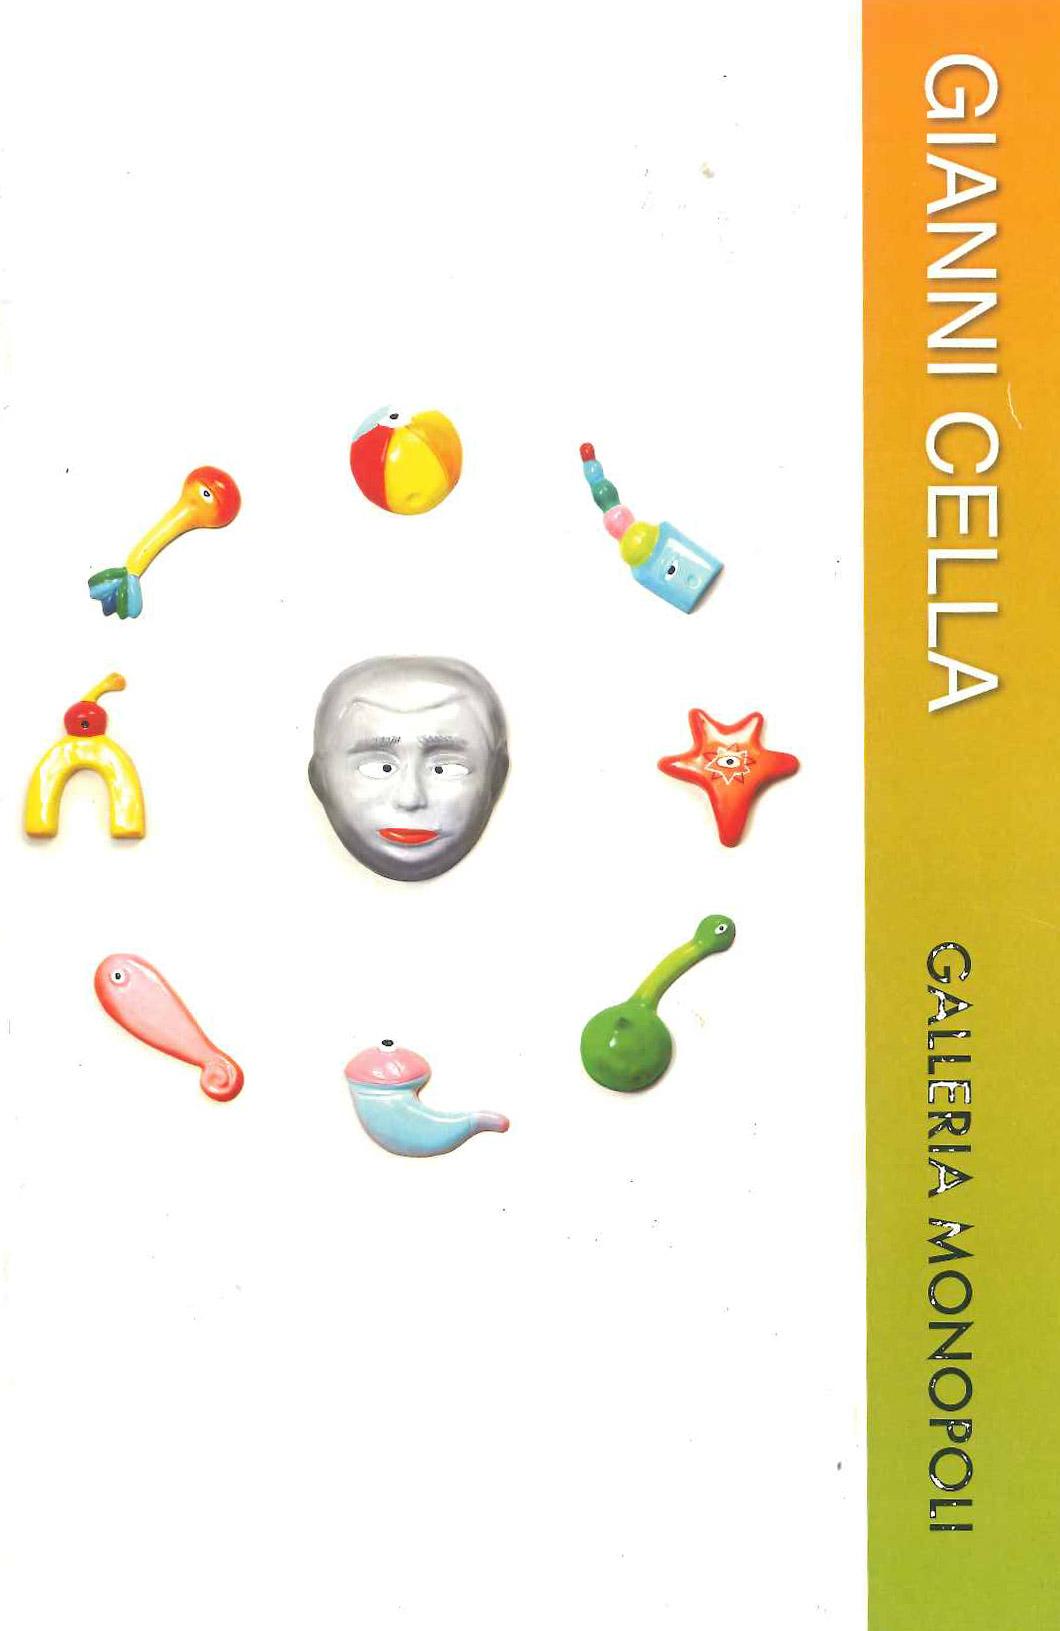 galleria-monopoli